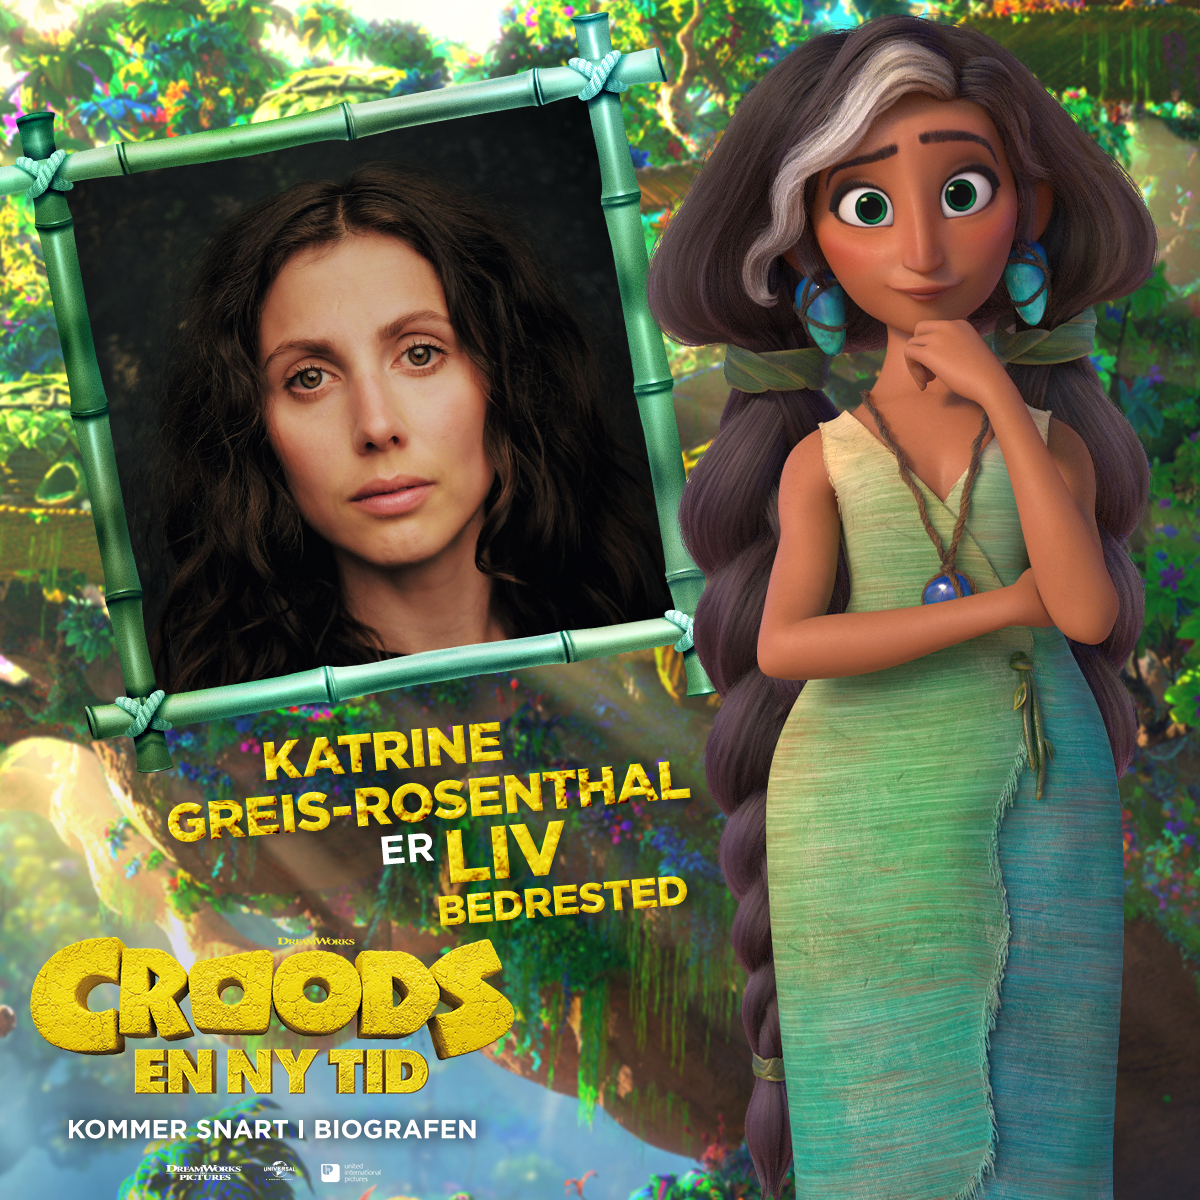 Croods - Karakterkort - Liv (Katrine Greis-Rosenthal)